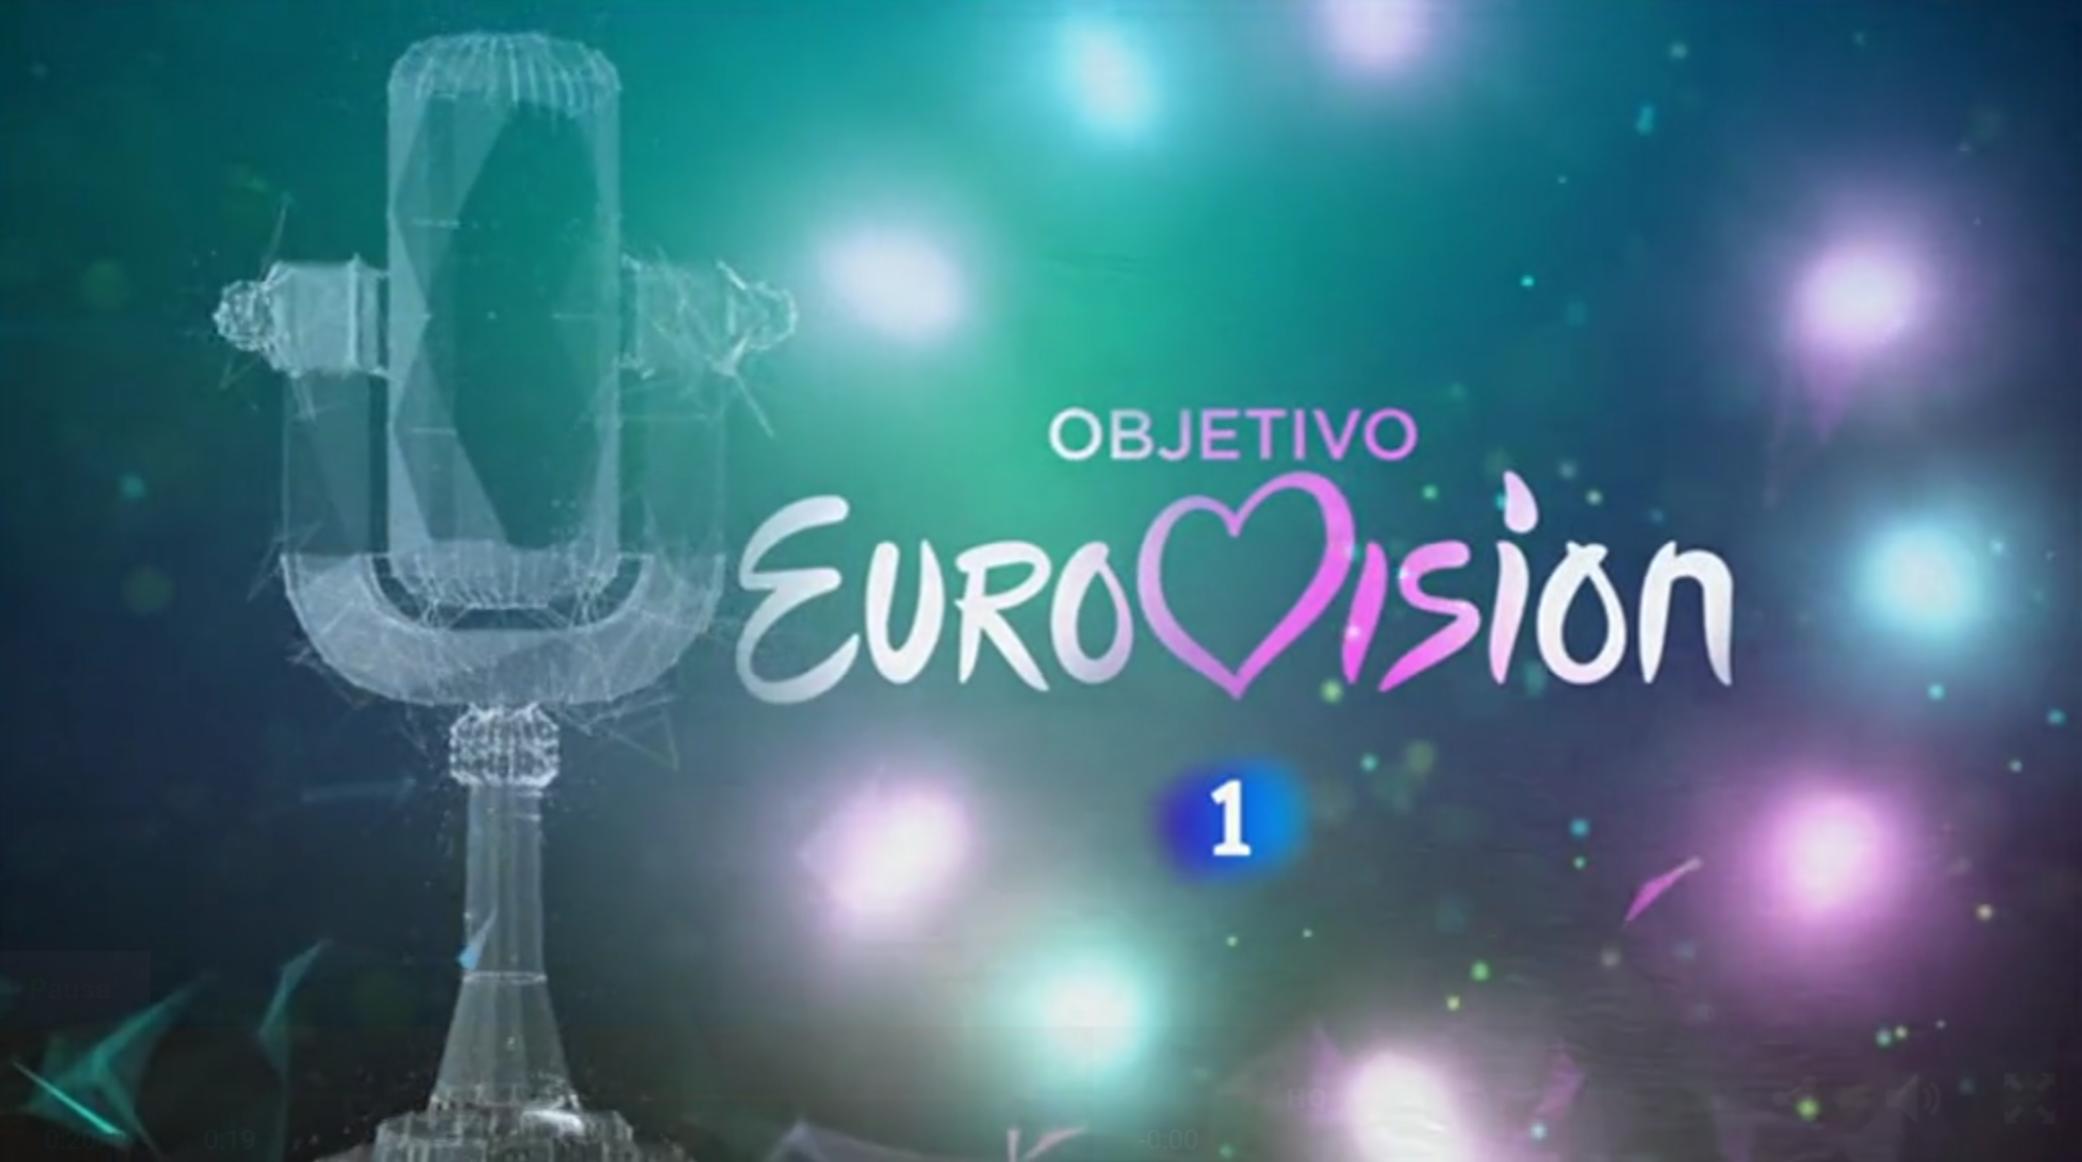 objectivo eurovision 2017 logo